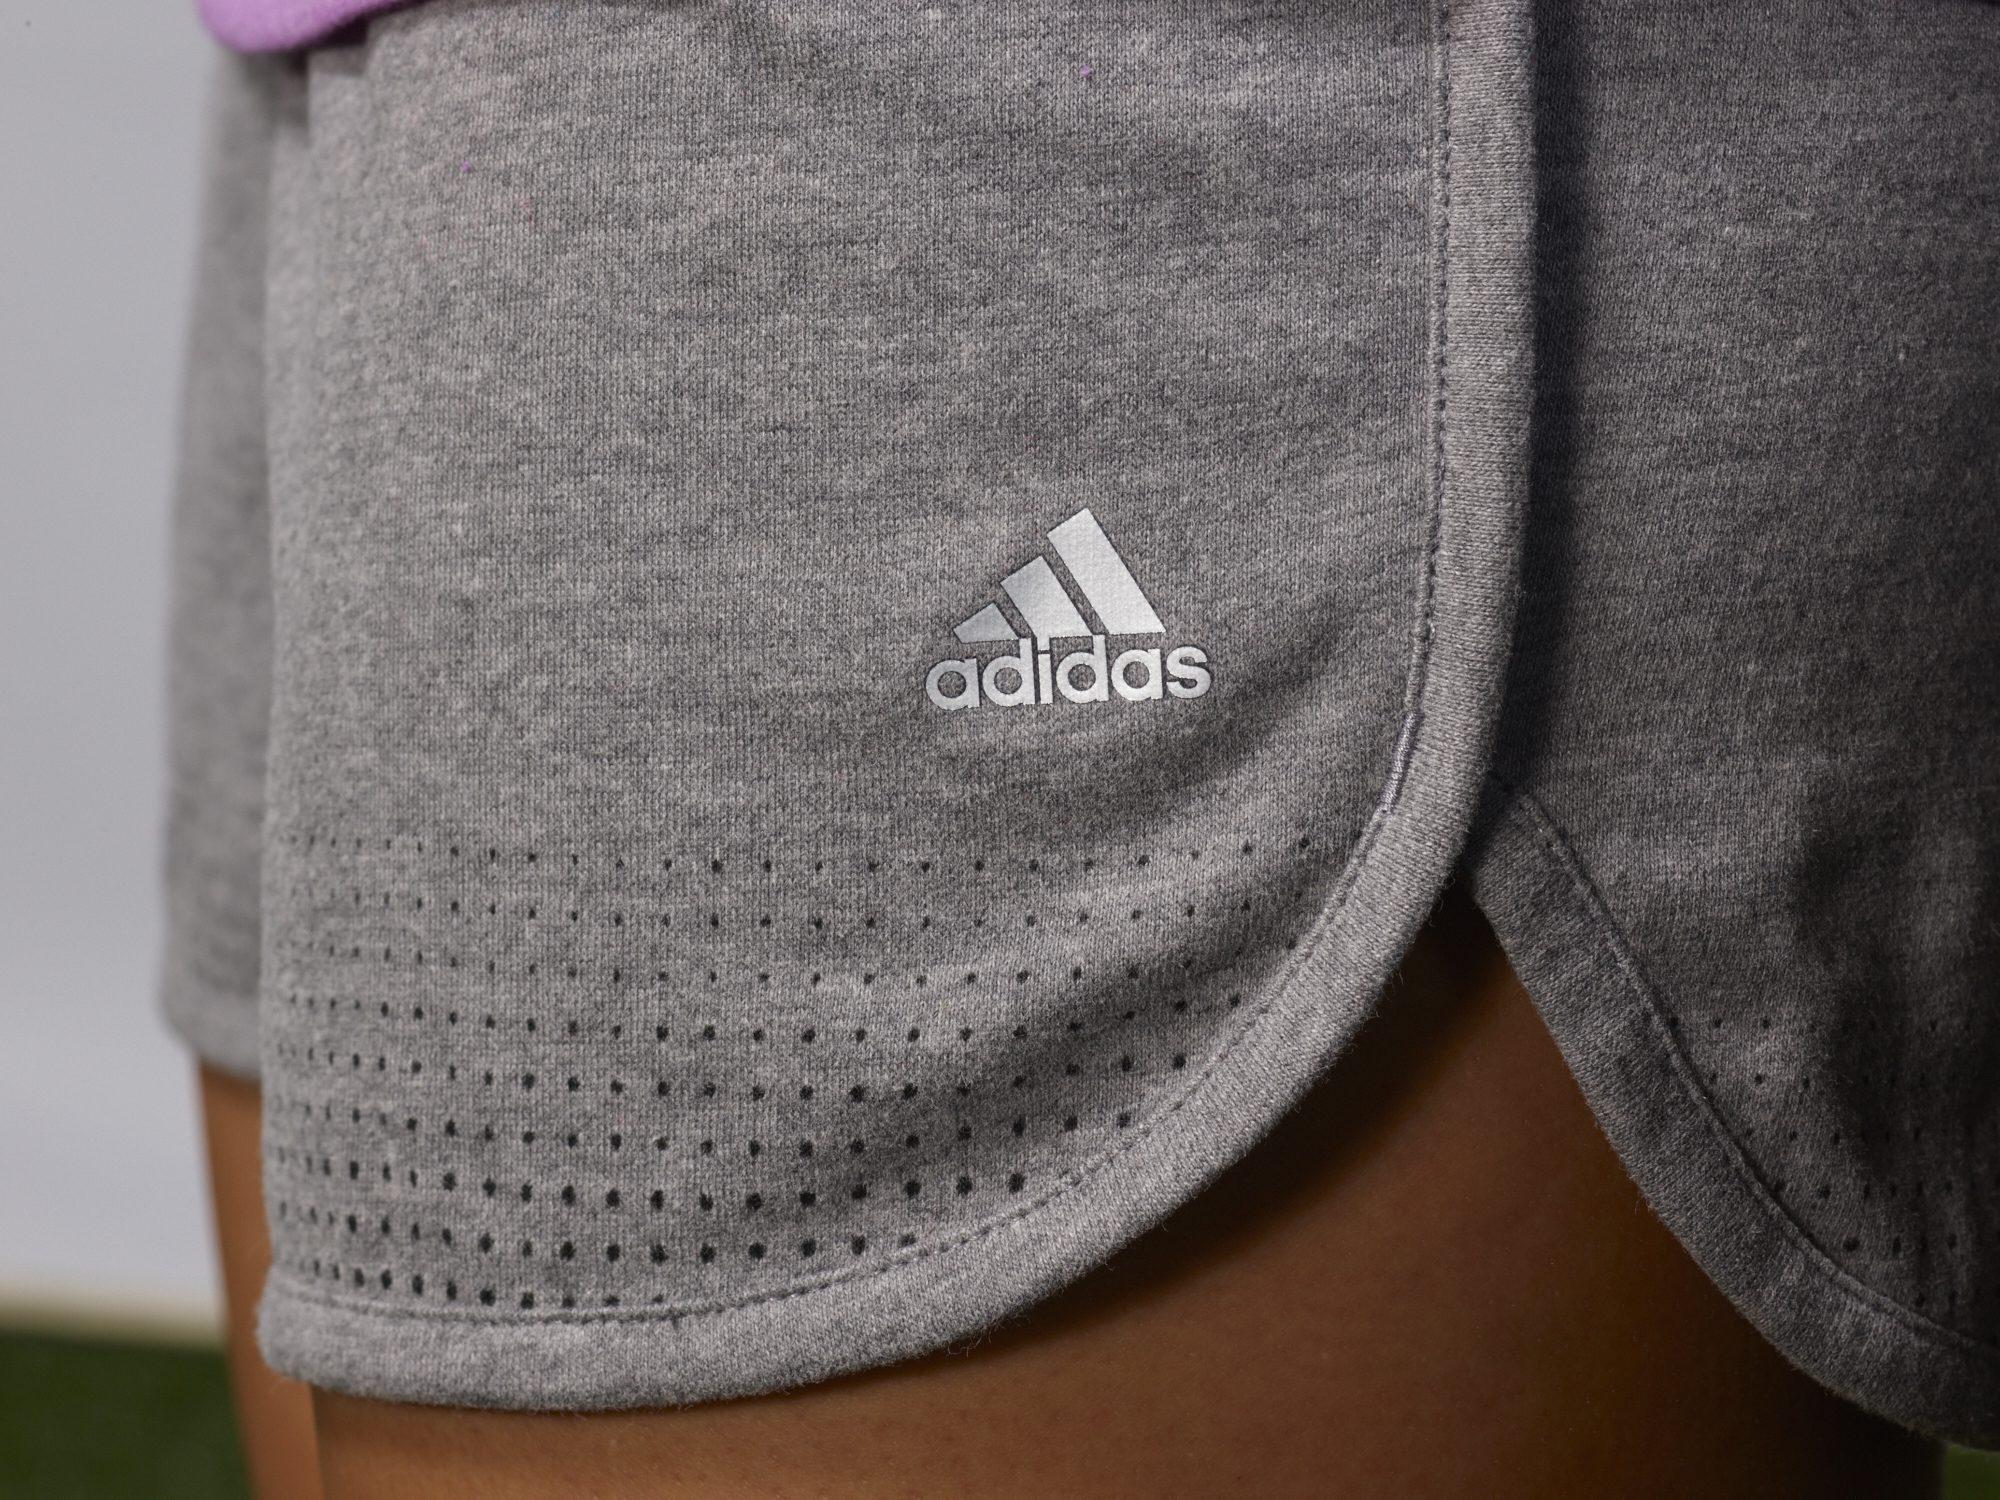 adidas_ss15climacool_Jonelle_detail2-0001